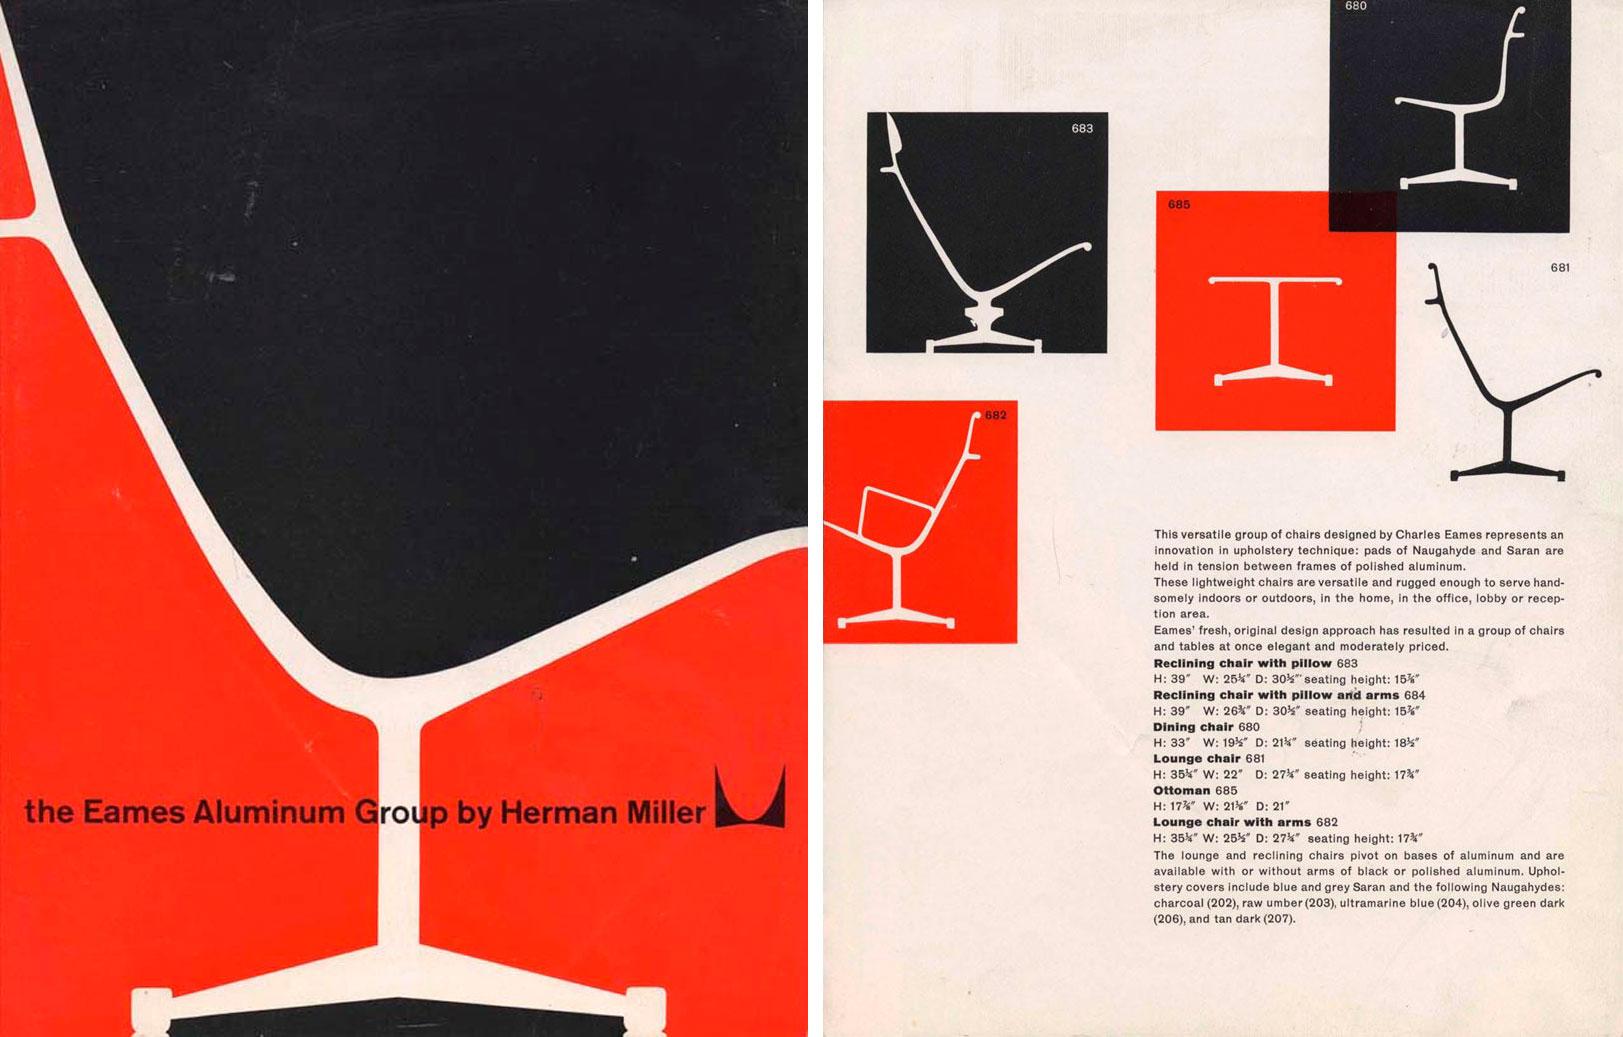 eames-aluminium-mobilier-brochure-herman-miller